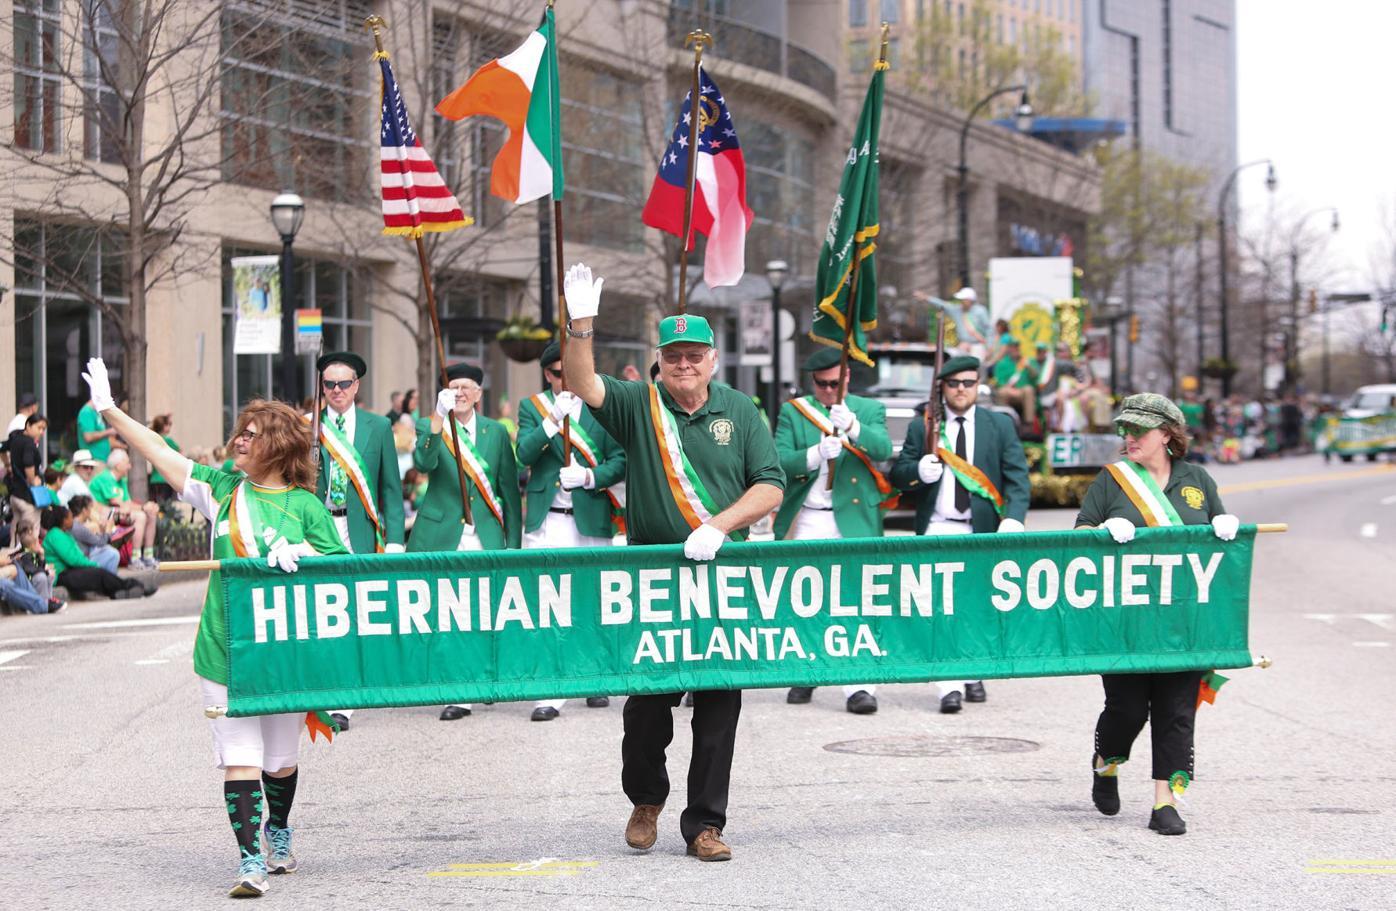 031319_MNS_St_Patricks_Day_001 Hibernian Benevolent Society of Atlanta